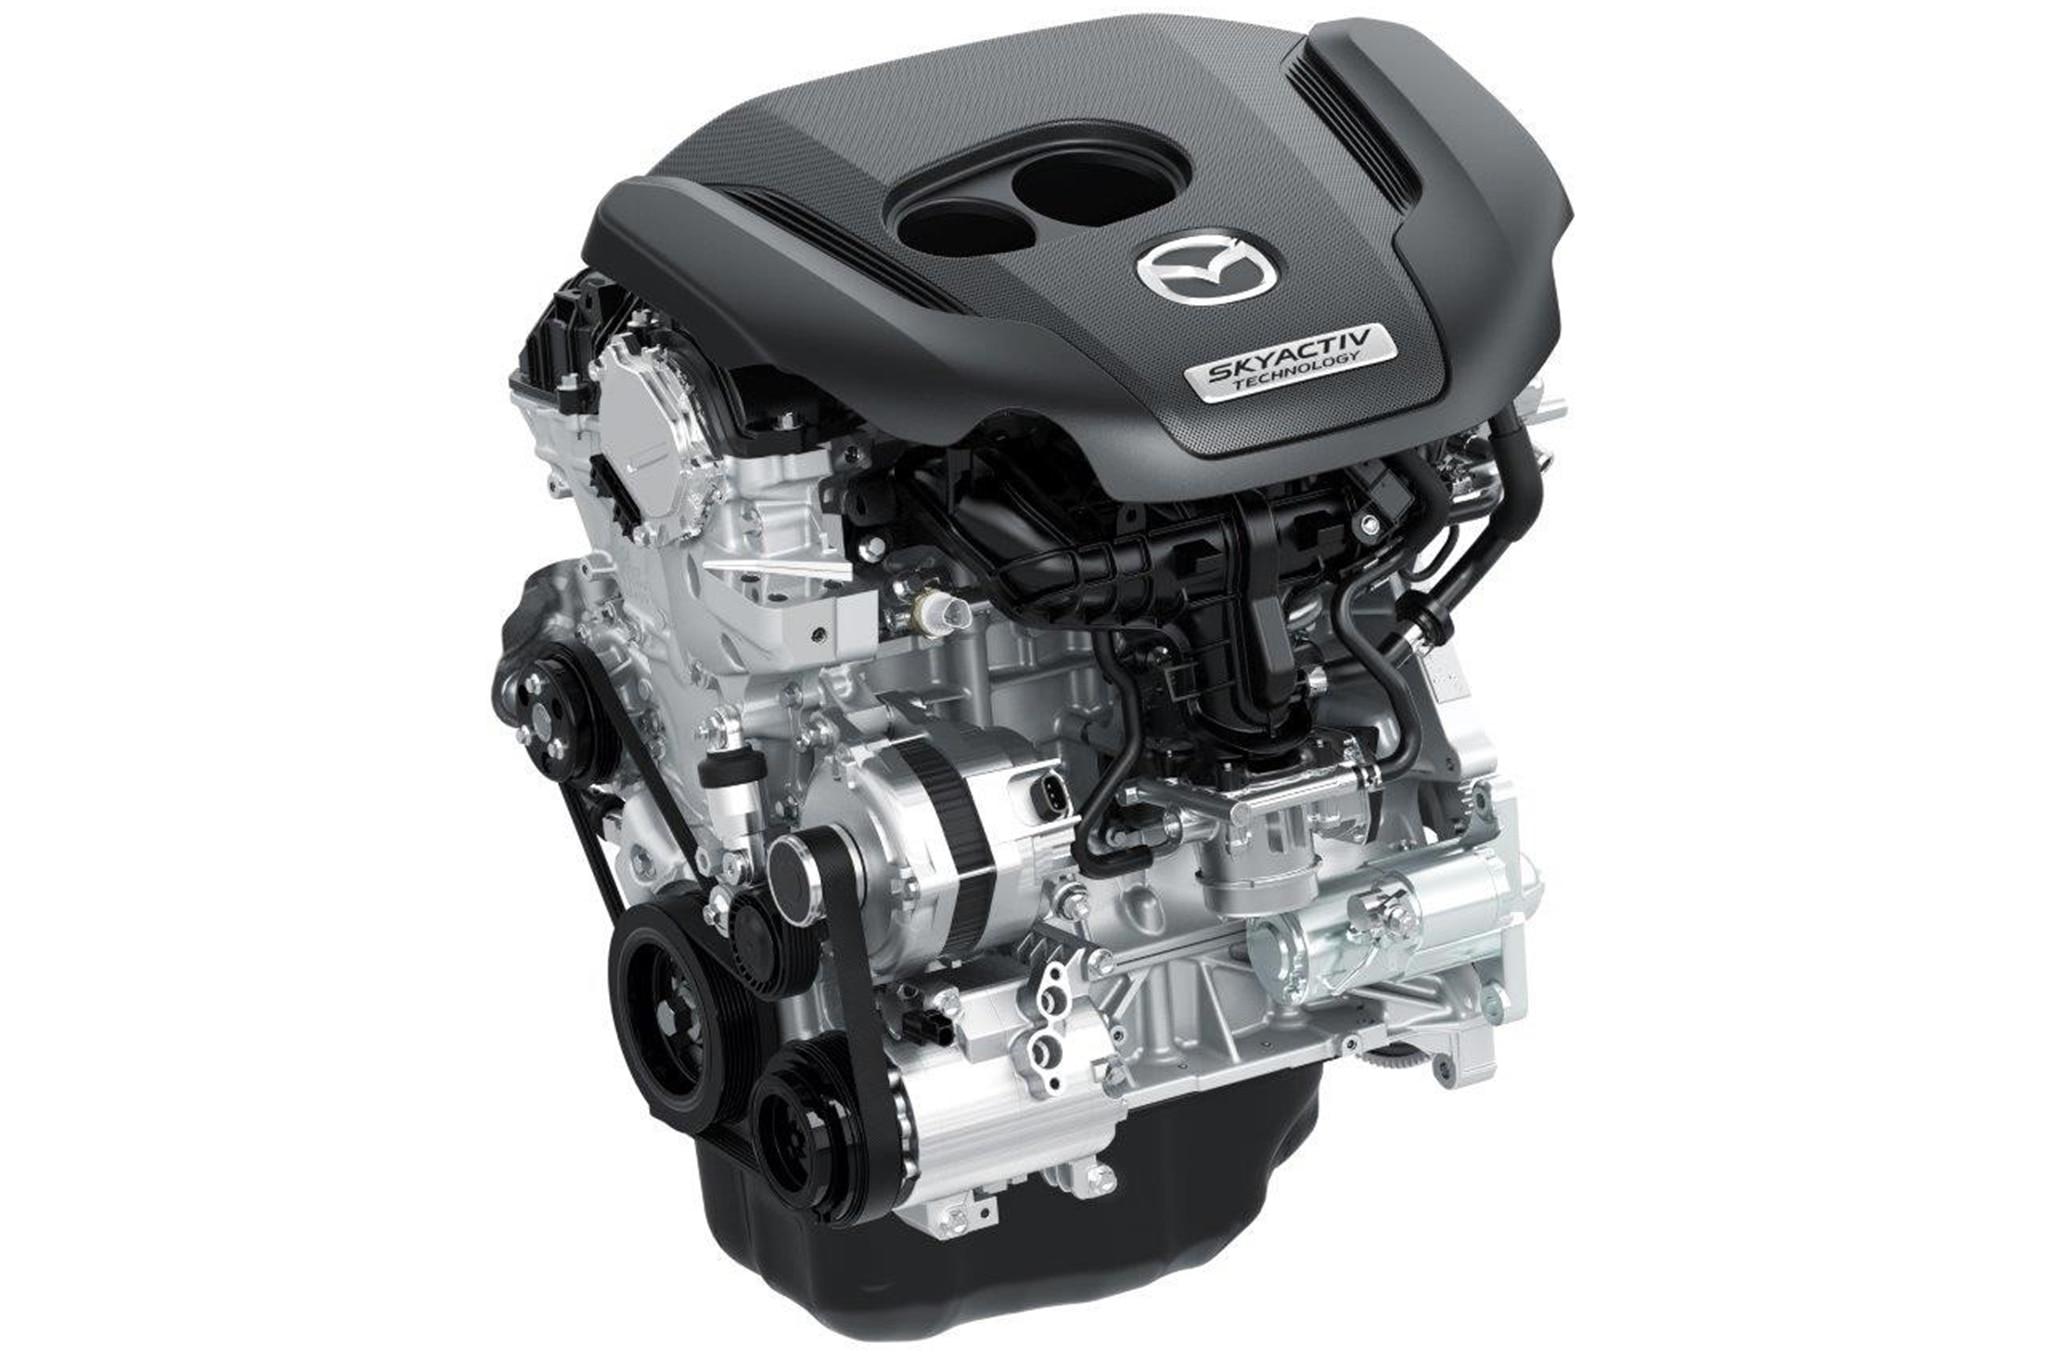 deep dive: inside the mazda skyactiv 2.5t turbo engine